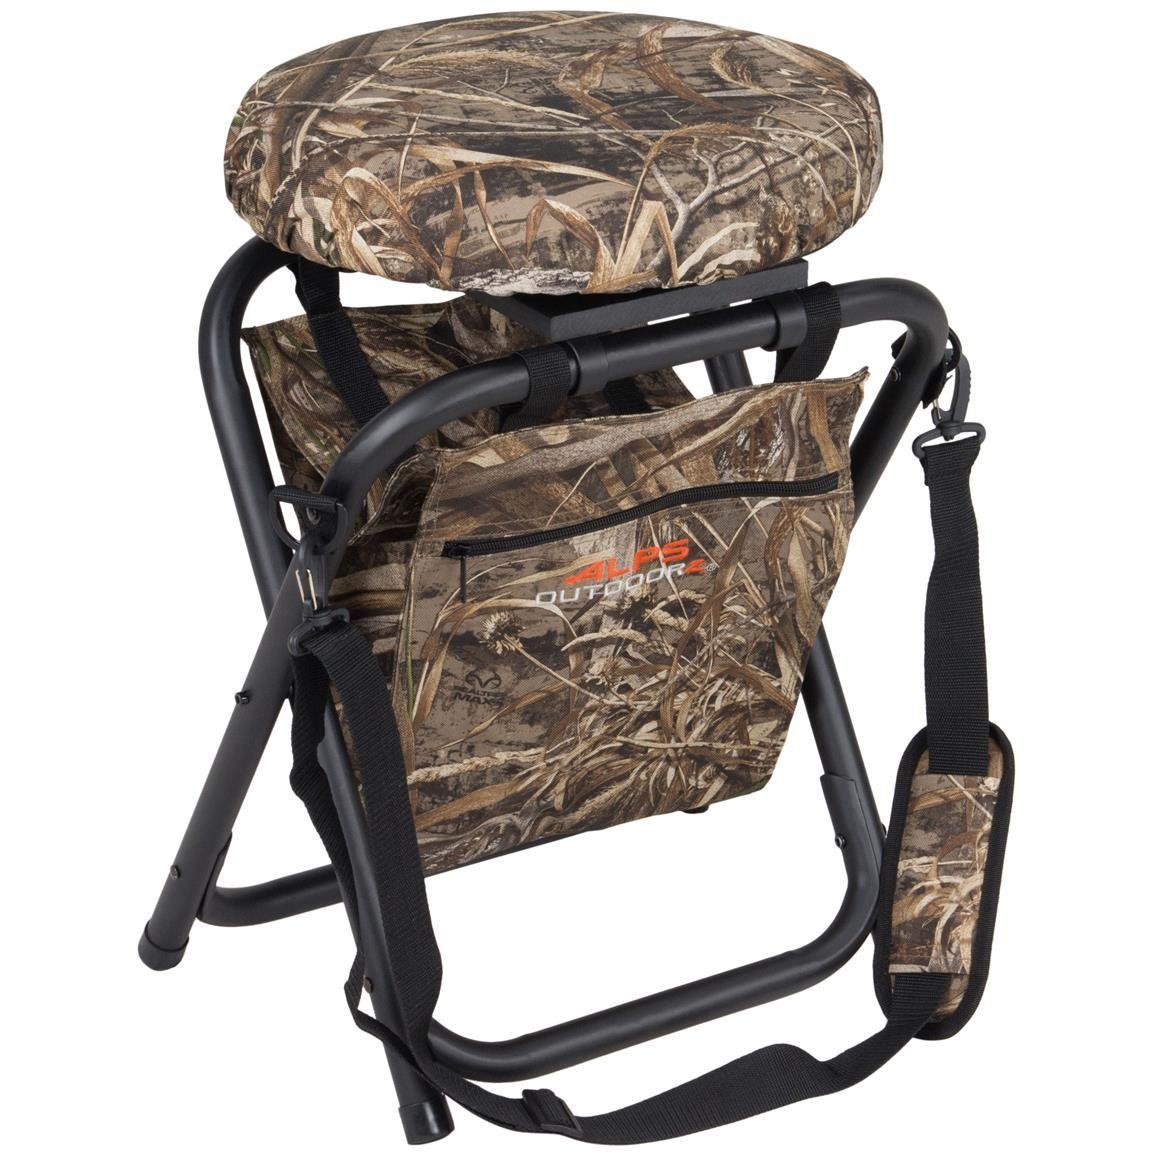 ALPS OutdoorZ Horizon 360° Hunting Stool Swivel stool